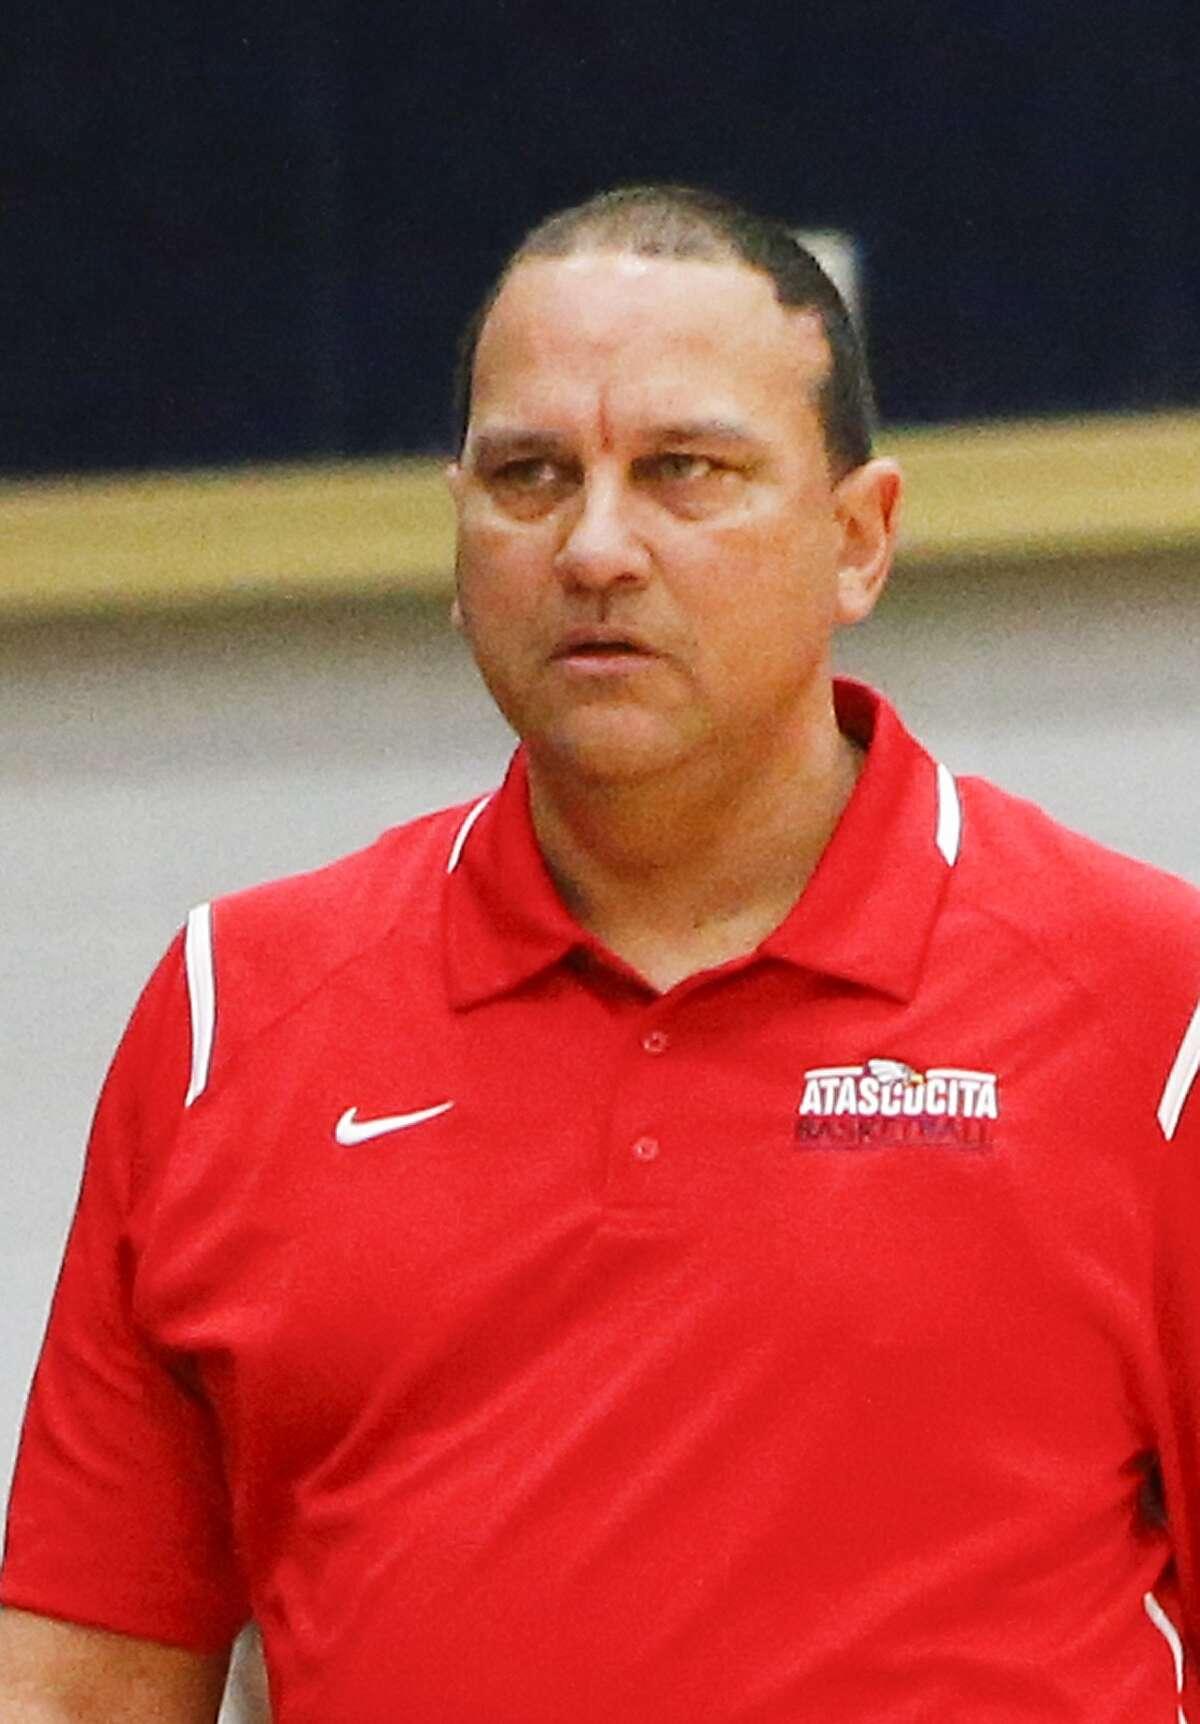 Atascocita head basketball coach David Martinez.